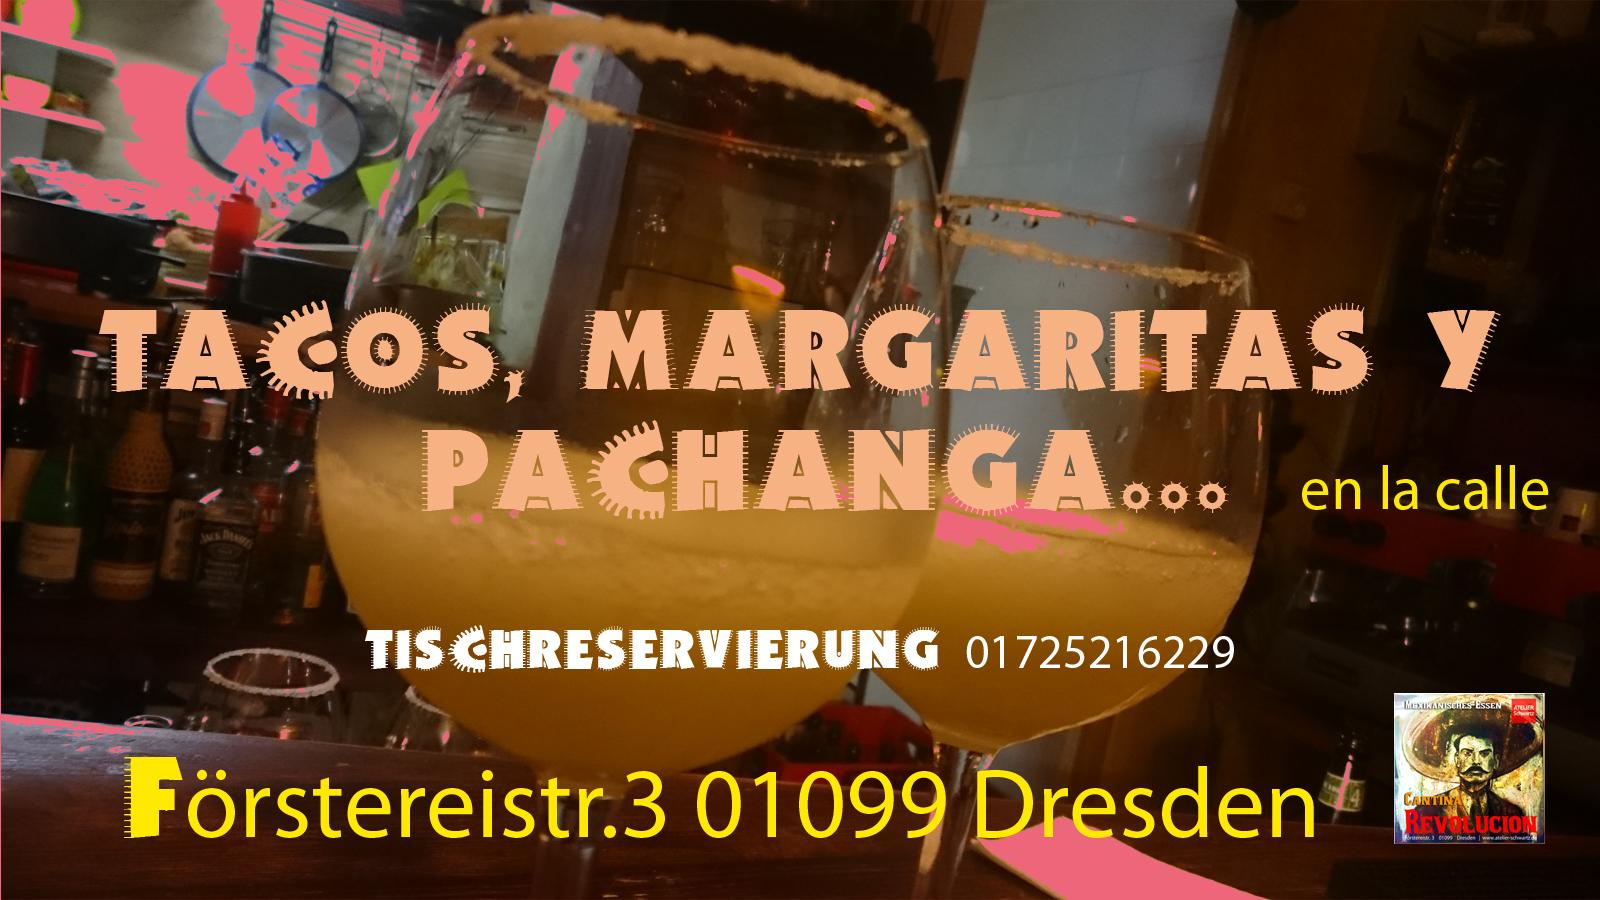 Tacos, margaritas y pachanga